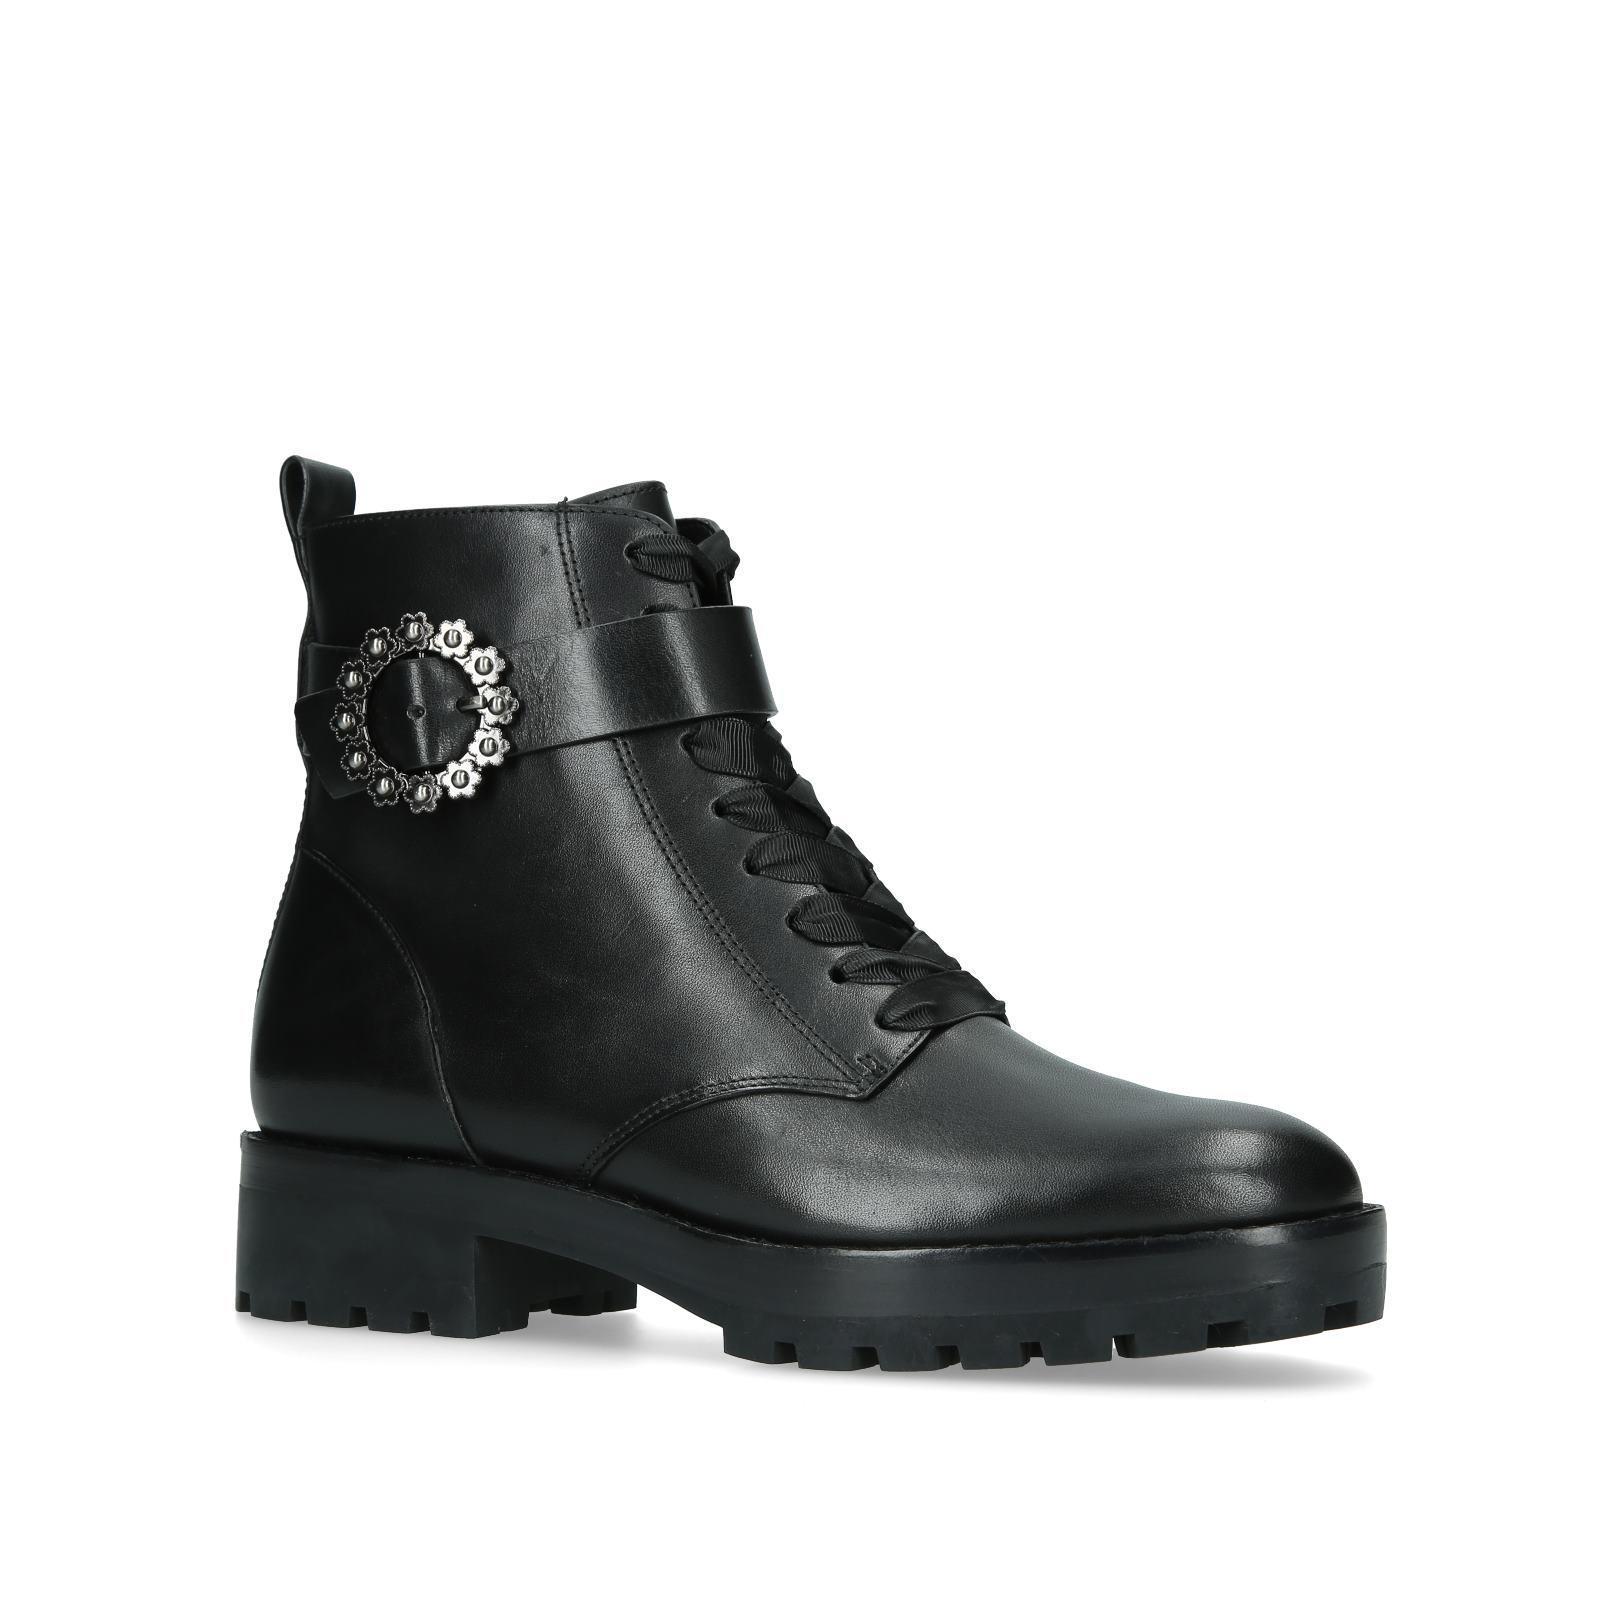 7a8cdafa22e7 Michael Michael Kors Ryder Ankle Boot in Black - Lyst